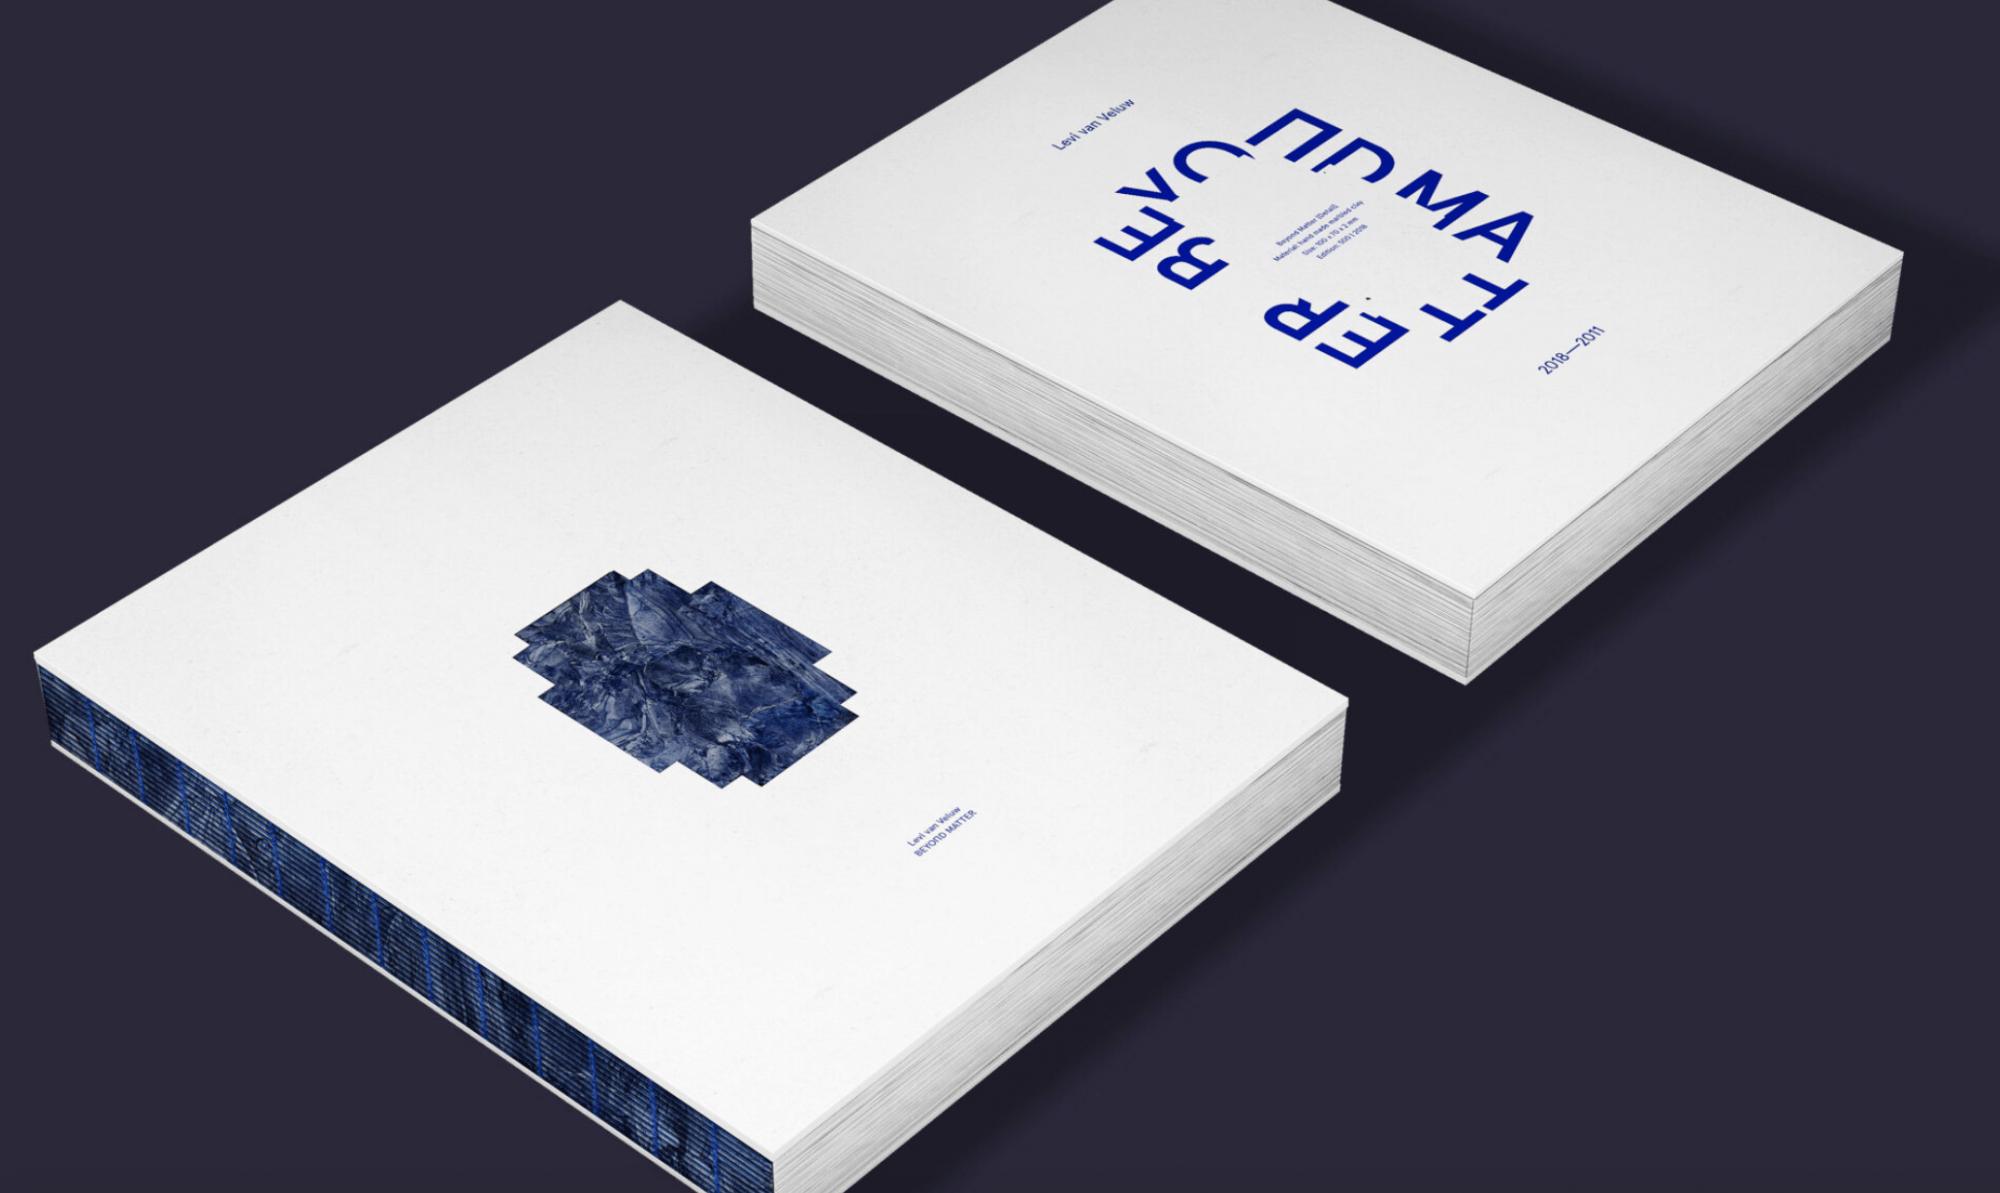 Book Launch | Beyond Matter by Levi van Veluw